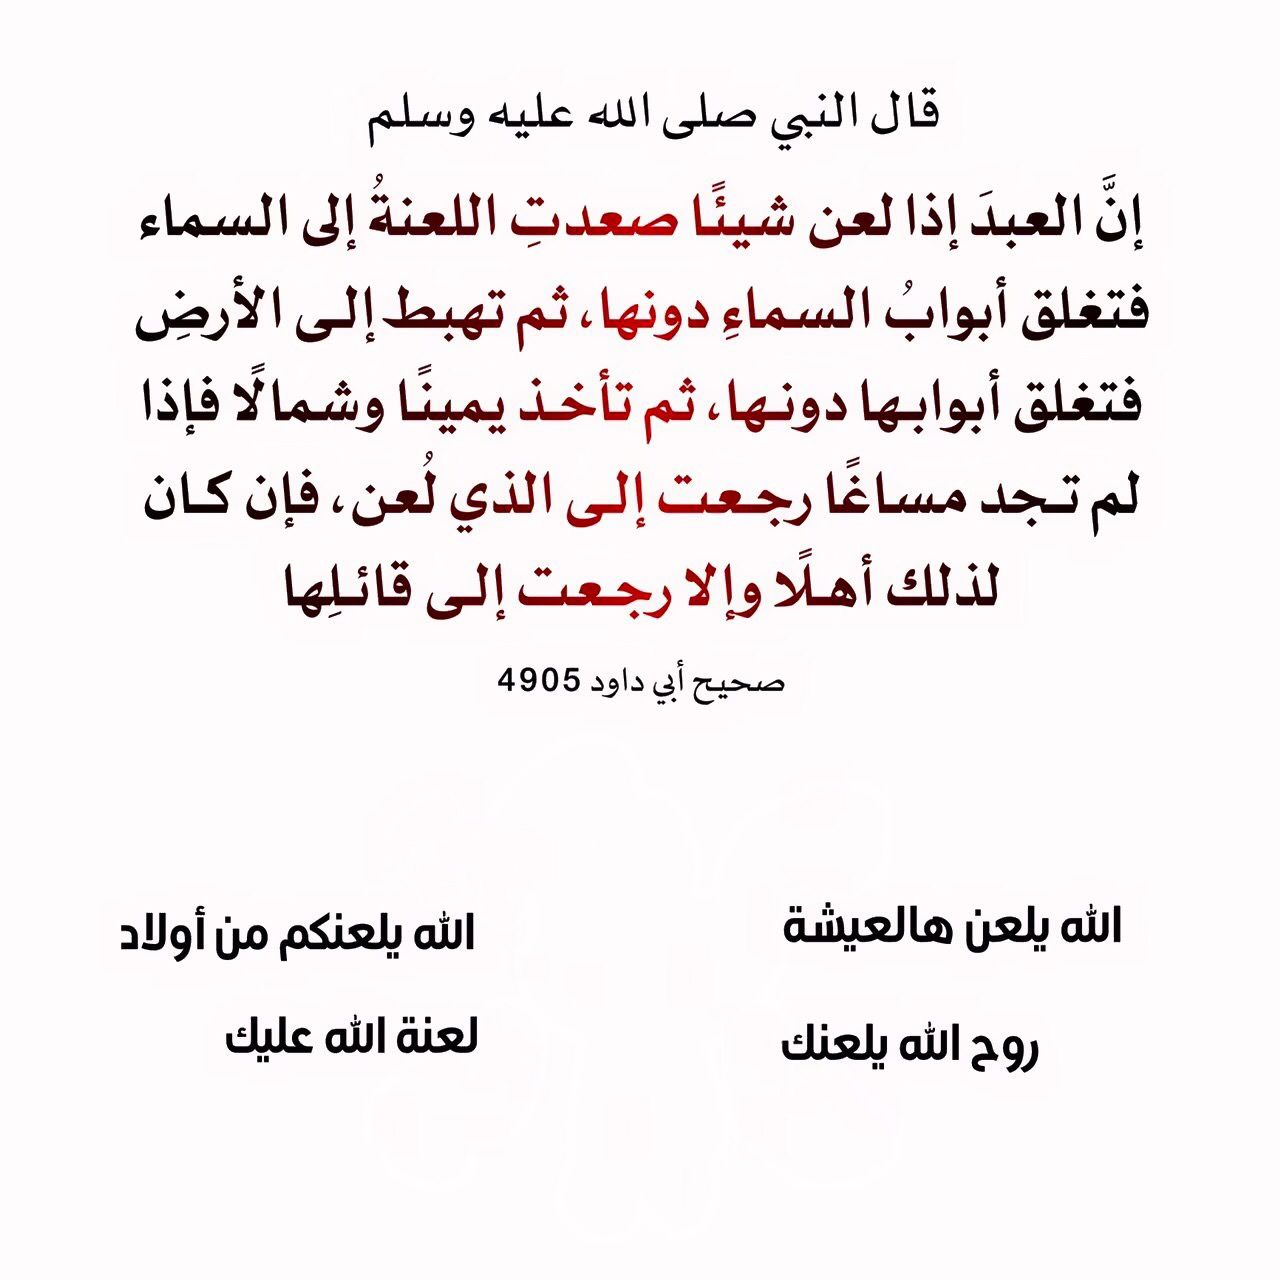 Pin By نشر الخير On أحاديث سيدنا محمد صلى الله عليه وسلم Math Wisdom Math Equations